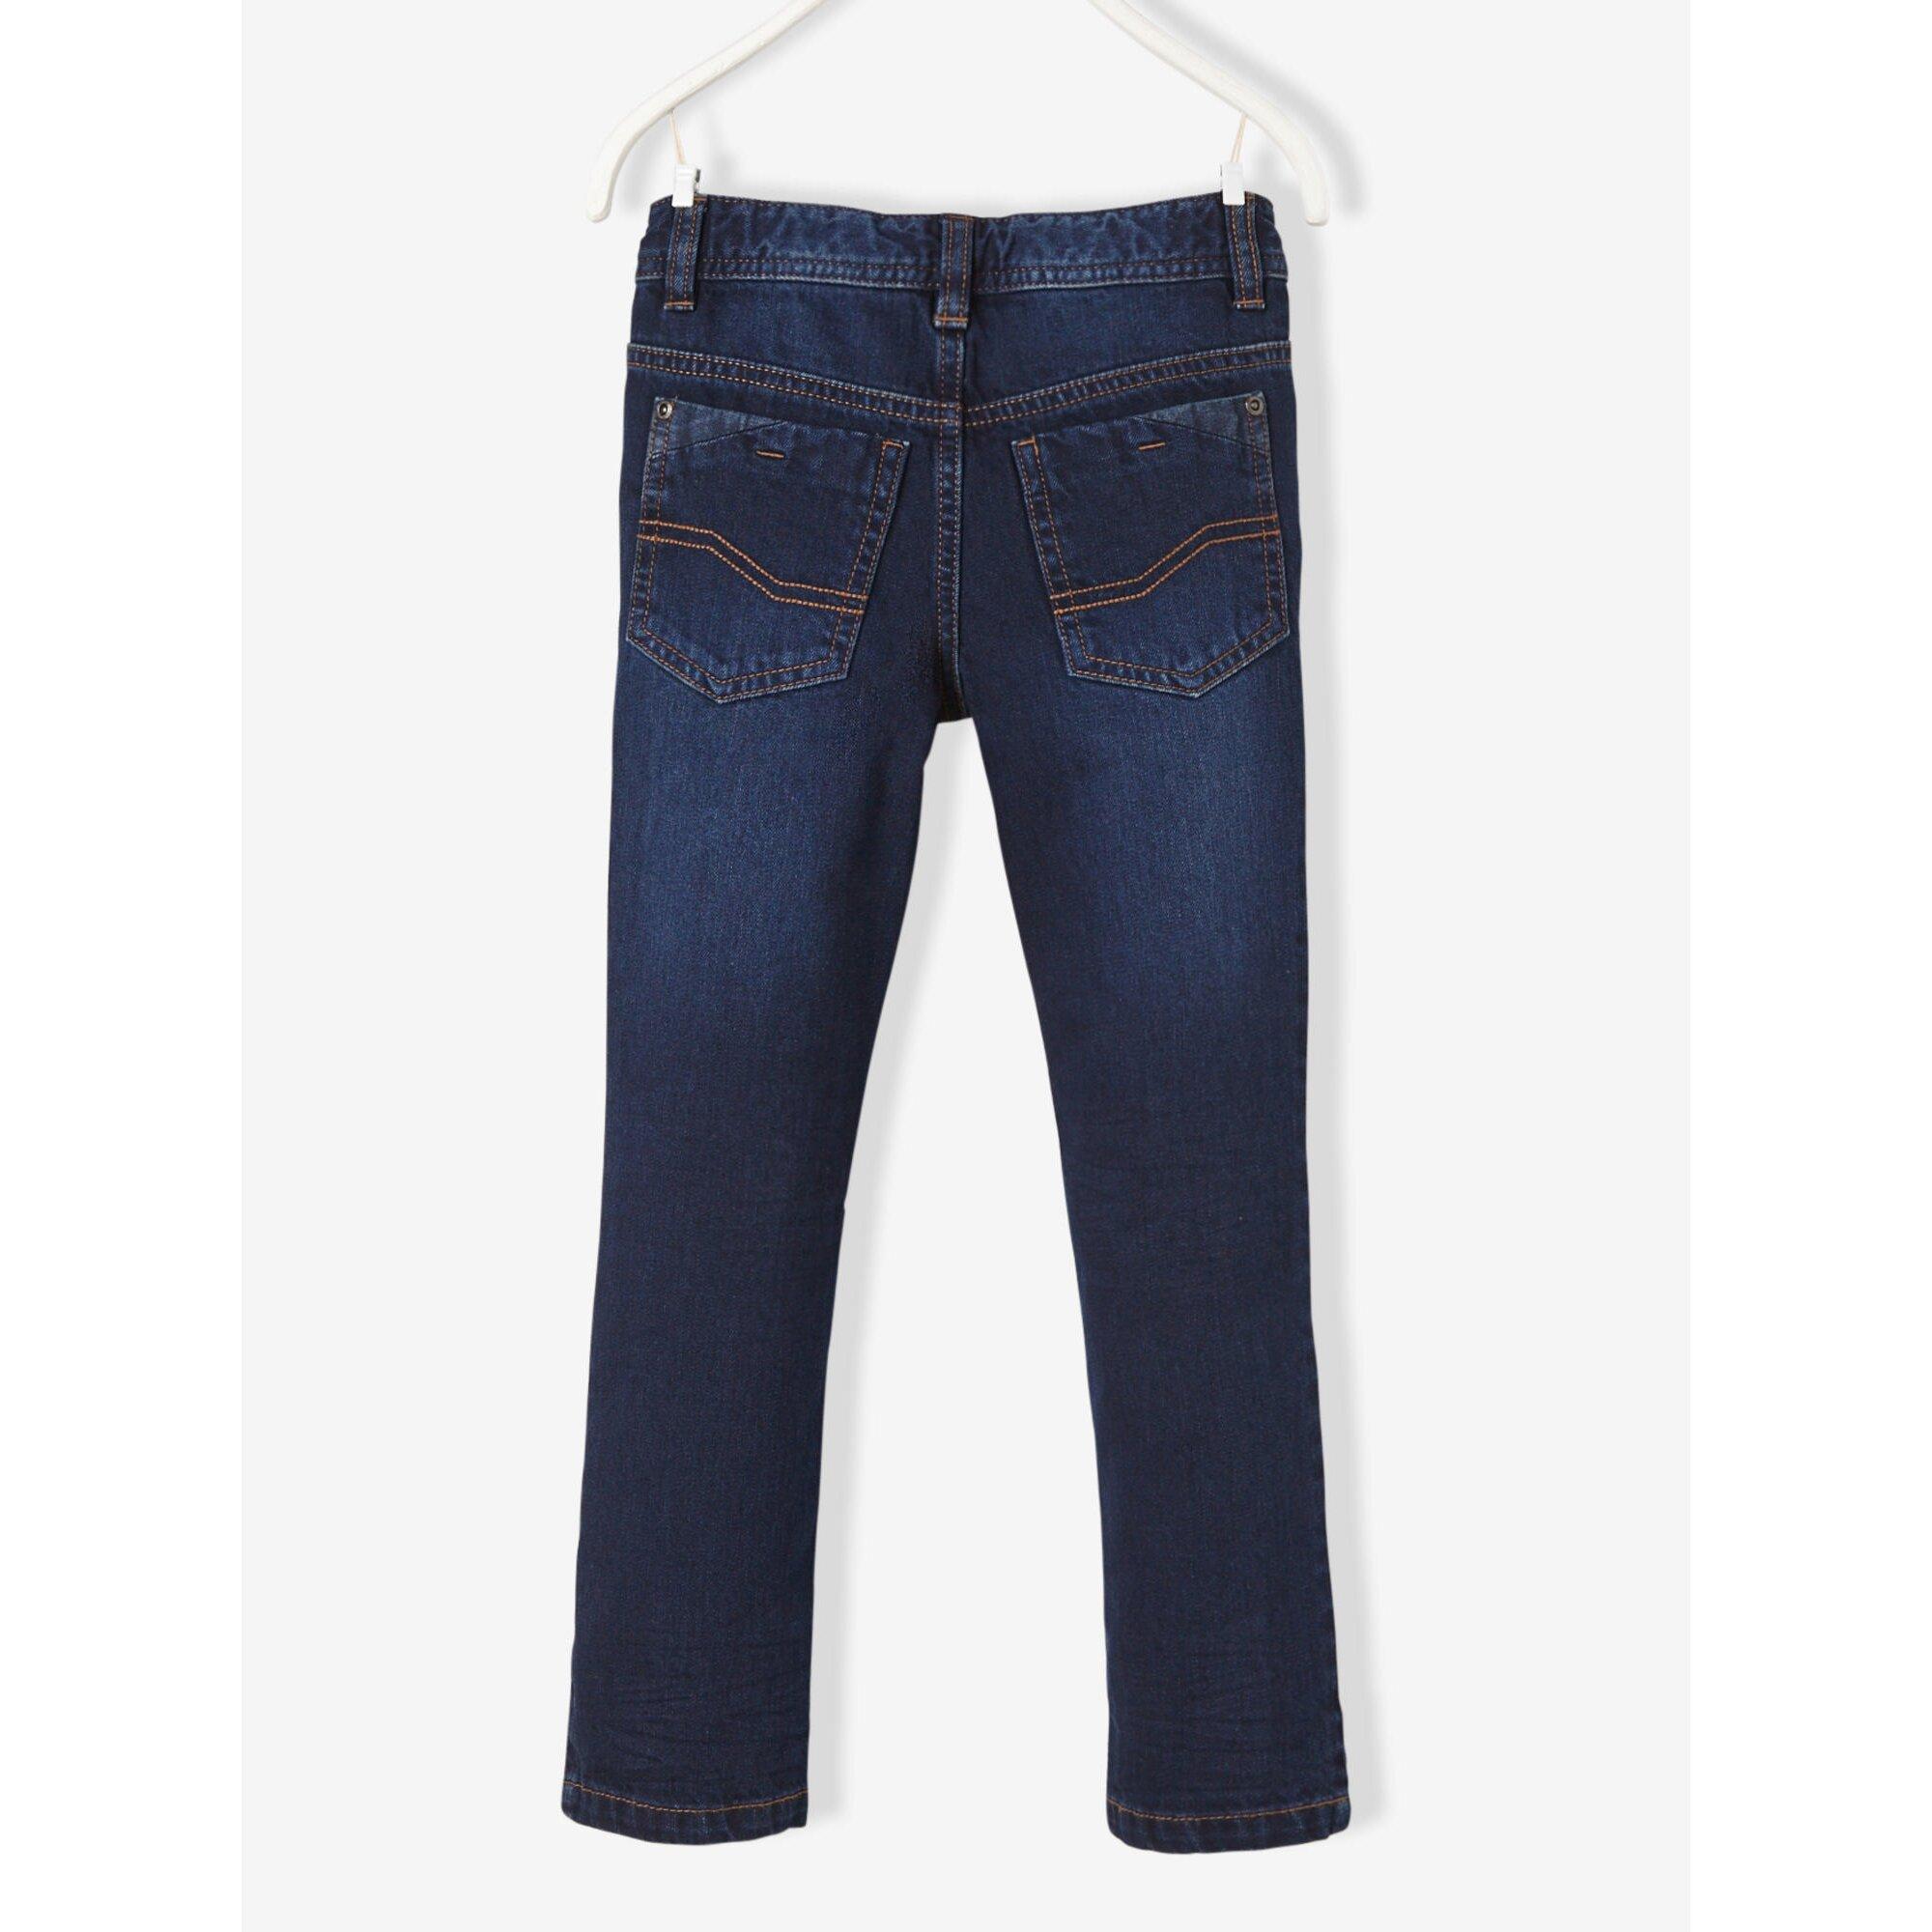 vertbaudet-gerade-jungen-jeans-huftweite-regular